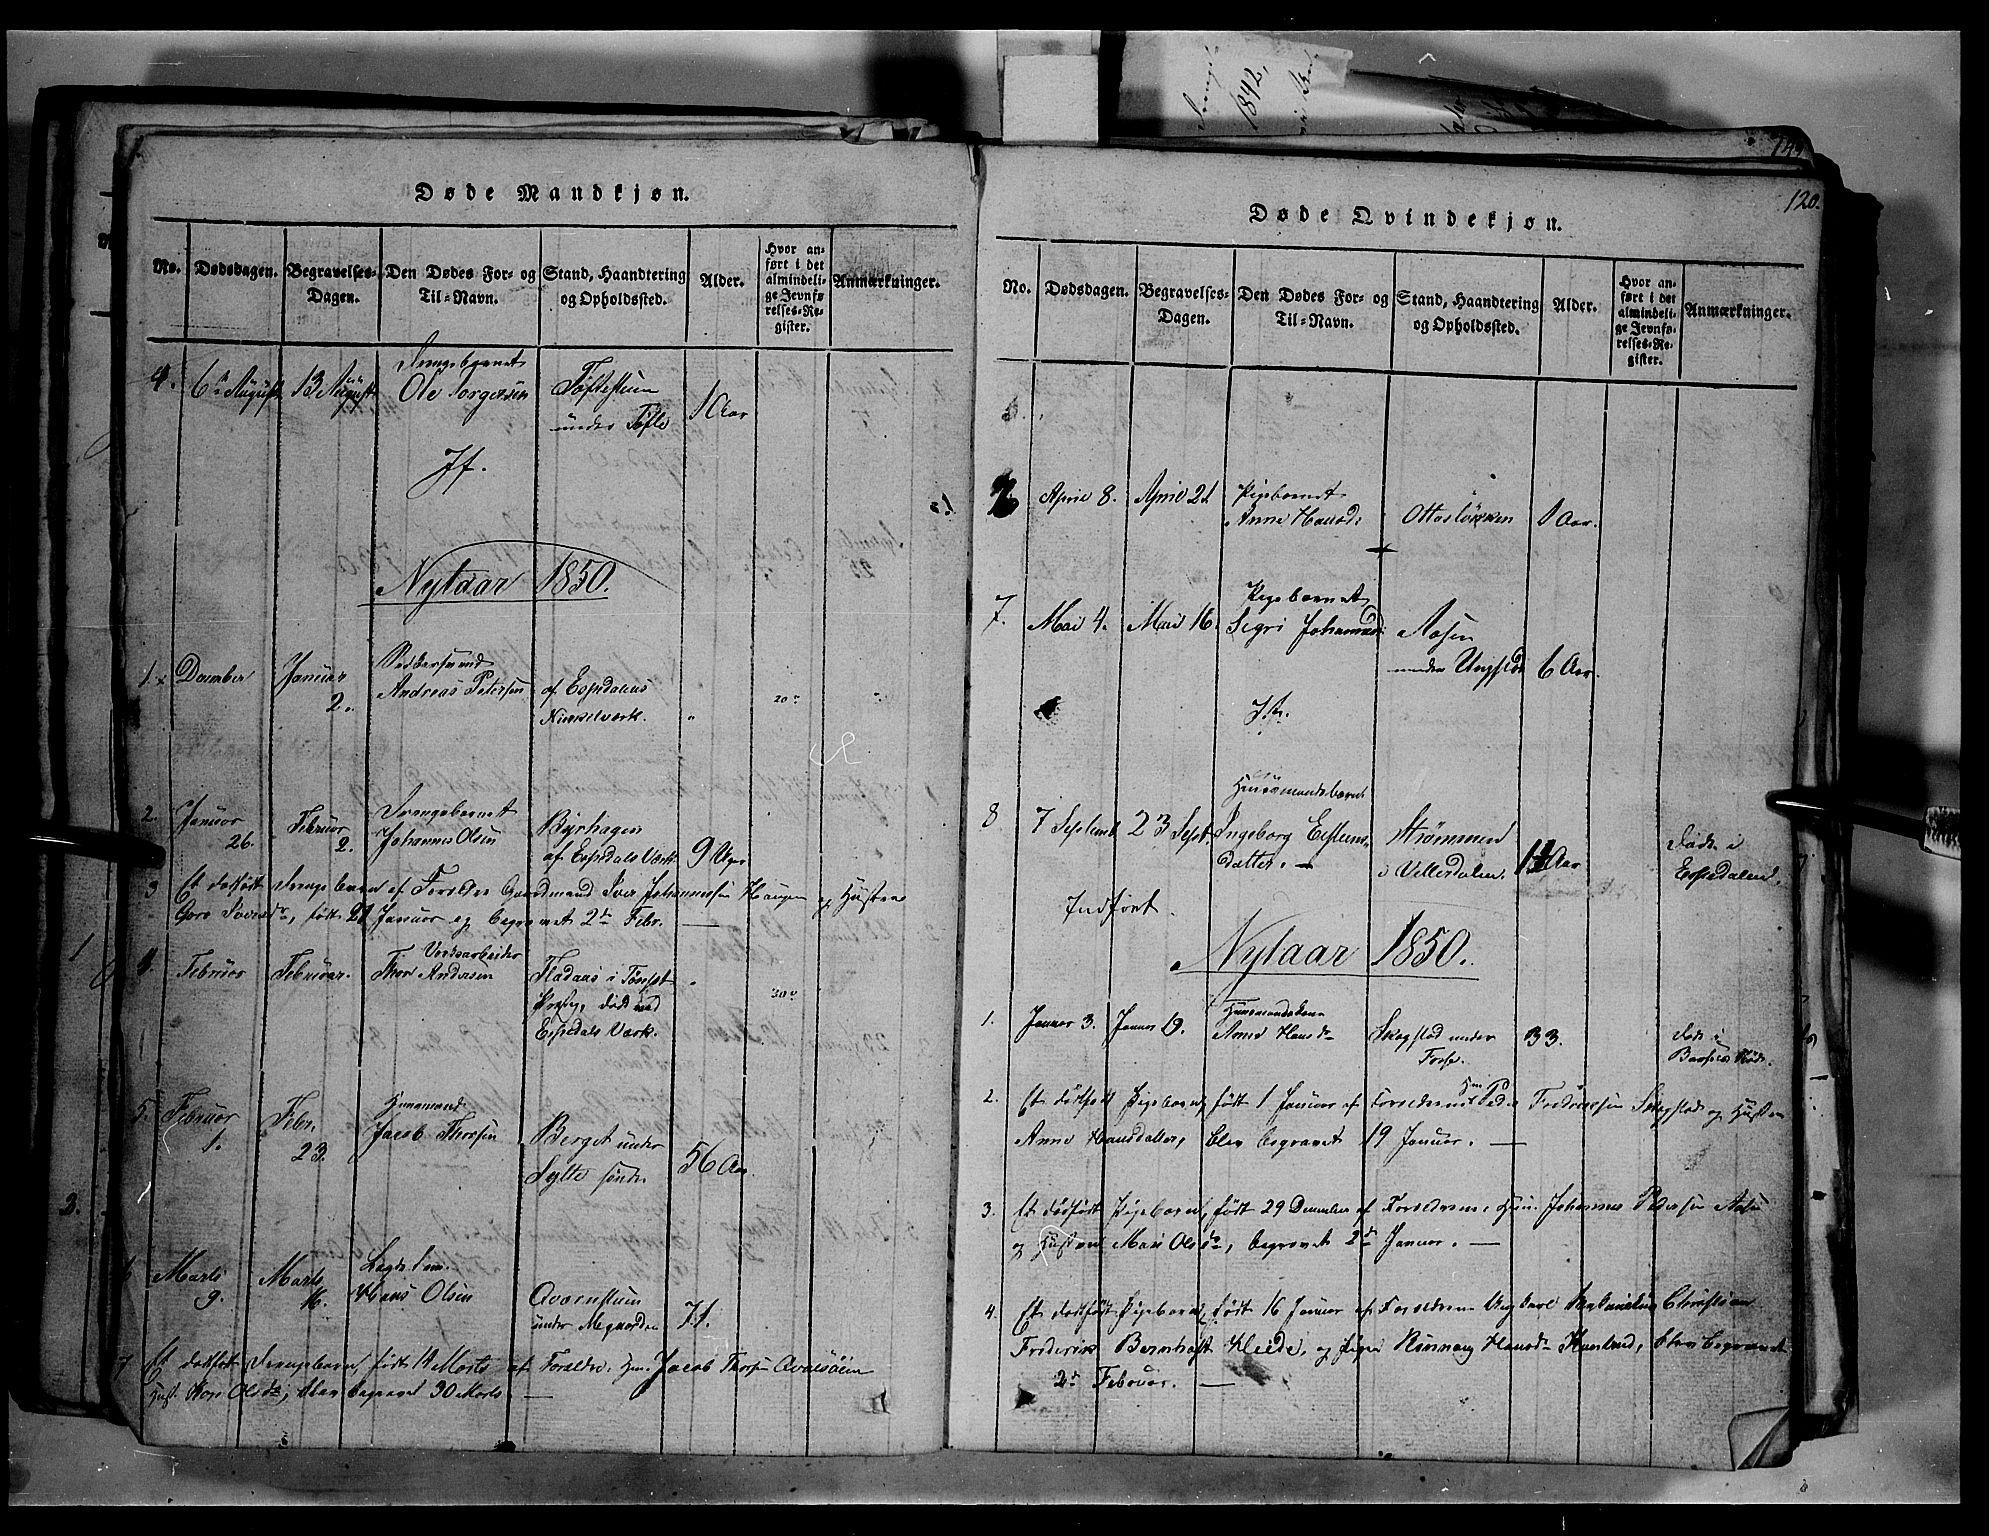 SAH, Fron prestekontor, H/Ha/Hab/L0003: Klokkerbok nr. 3, 1816-1850, s. 120